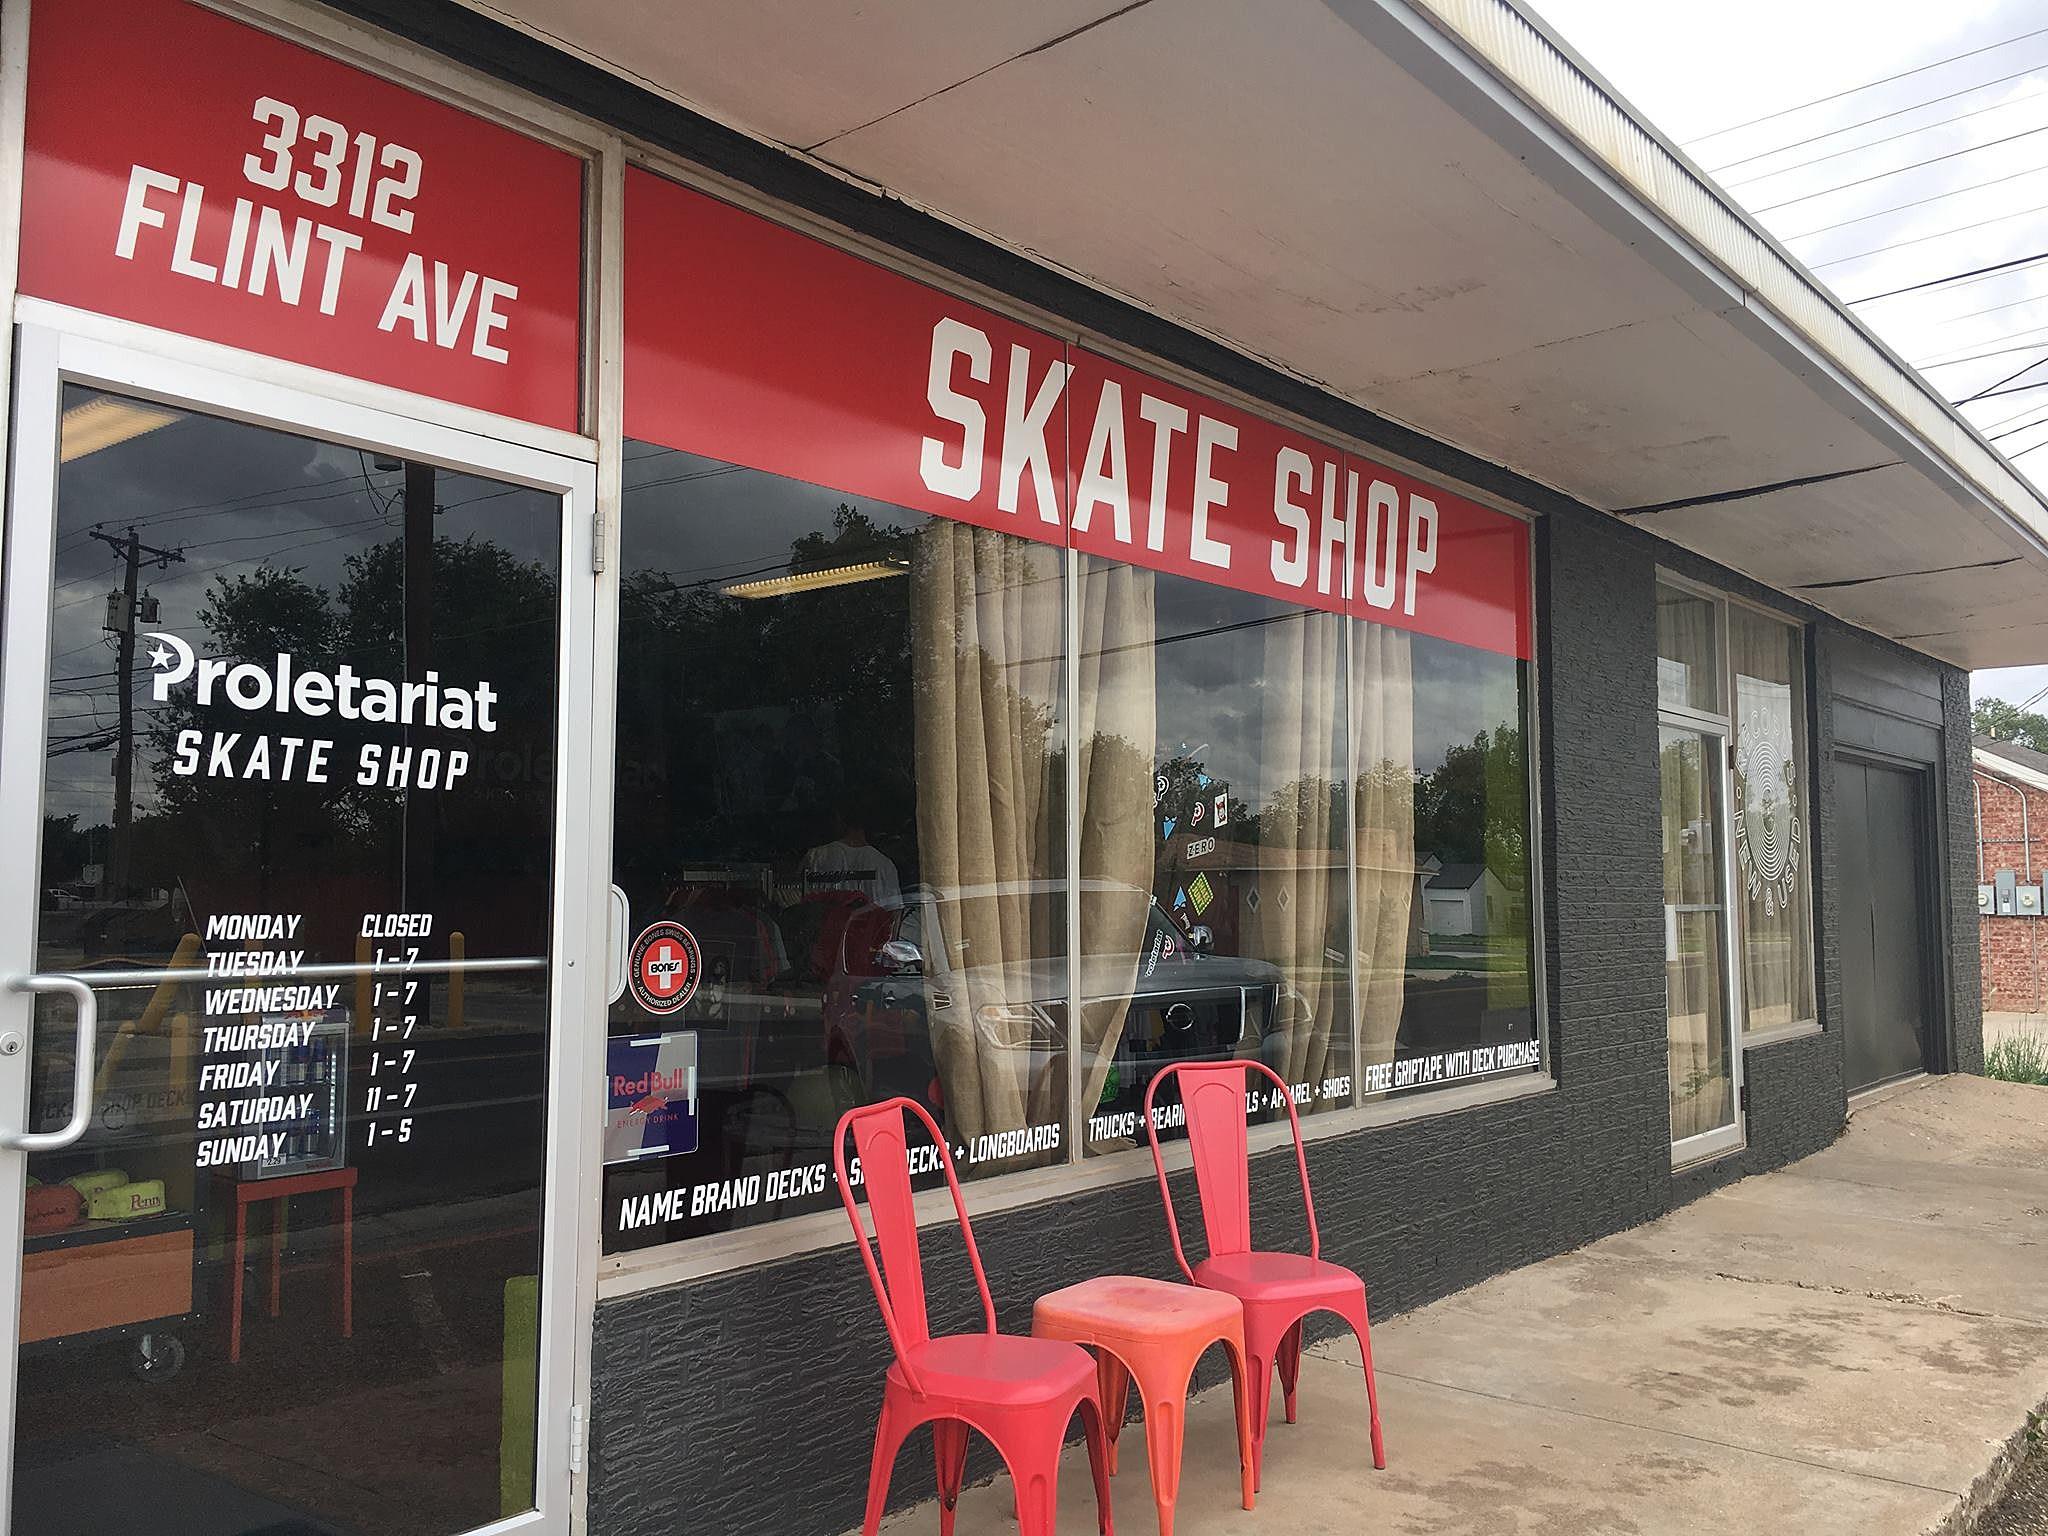 Proletariat Skateboard Co  Shop Now Open in Central Lubbock